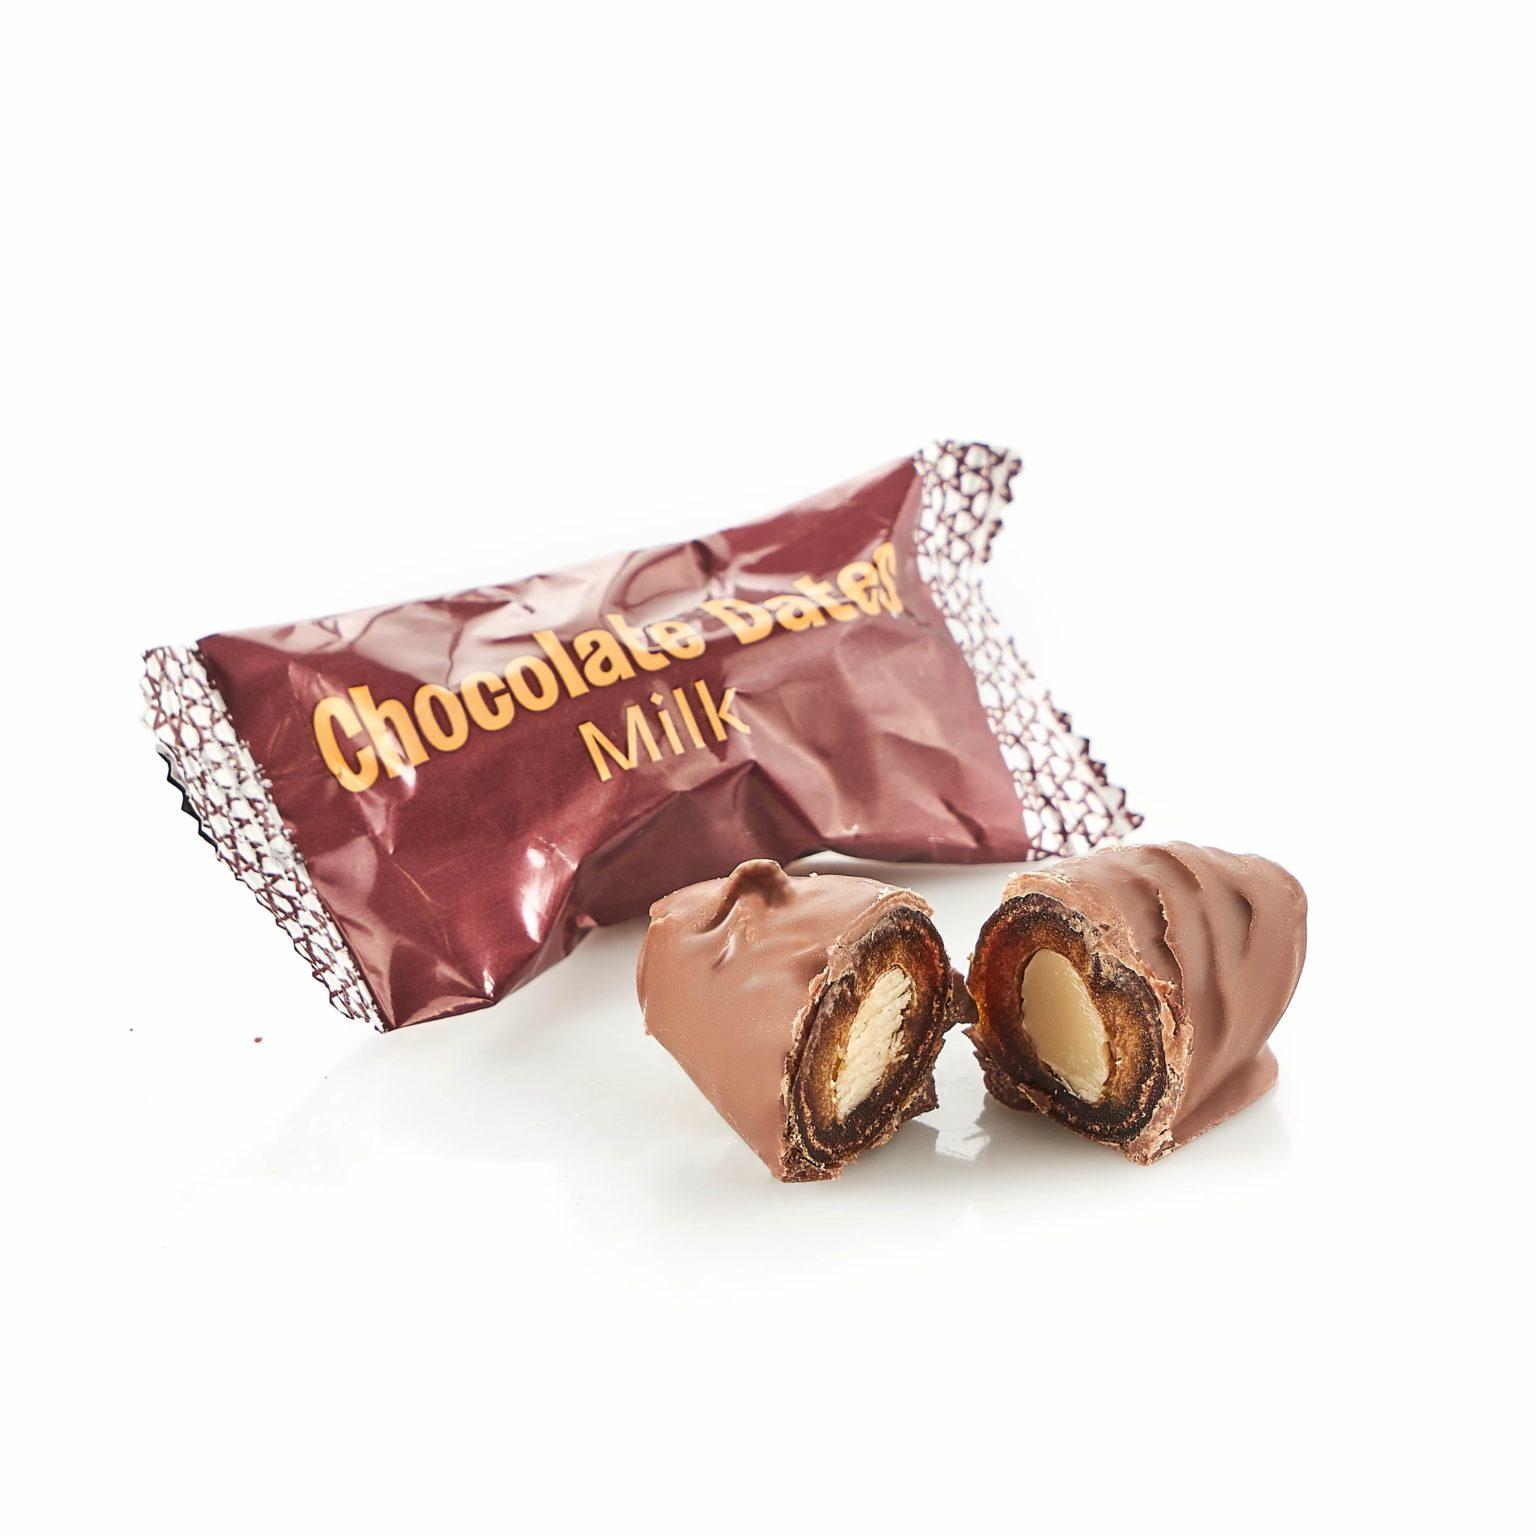 Финики в молочном шоколаде - фото 4